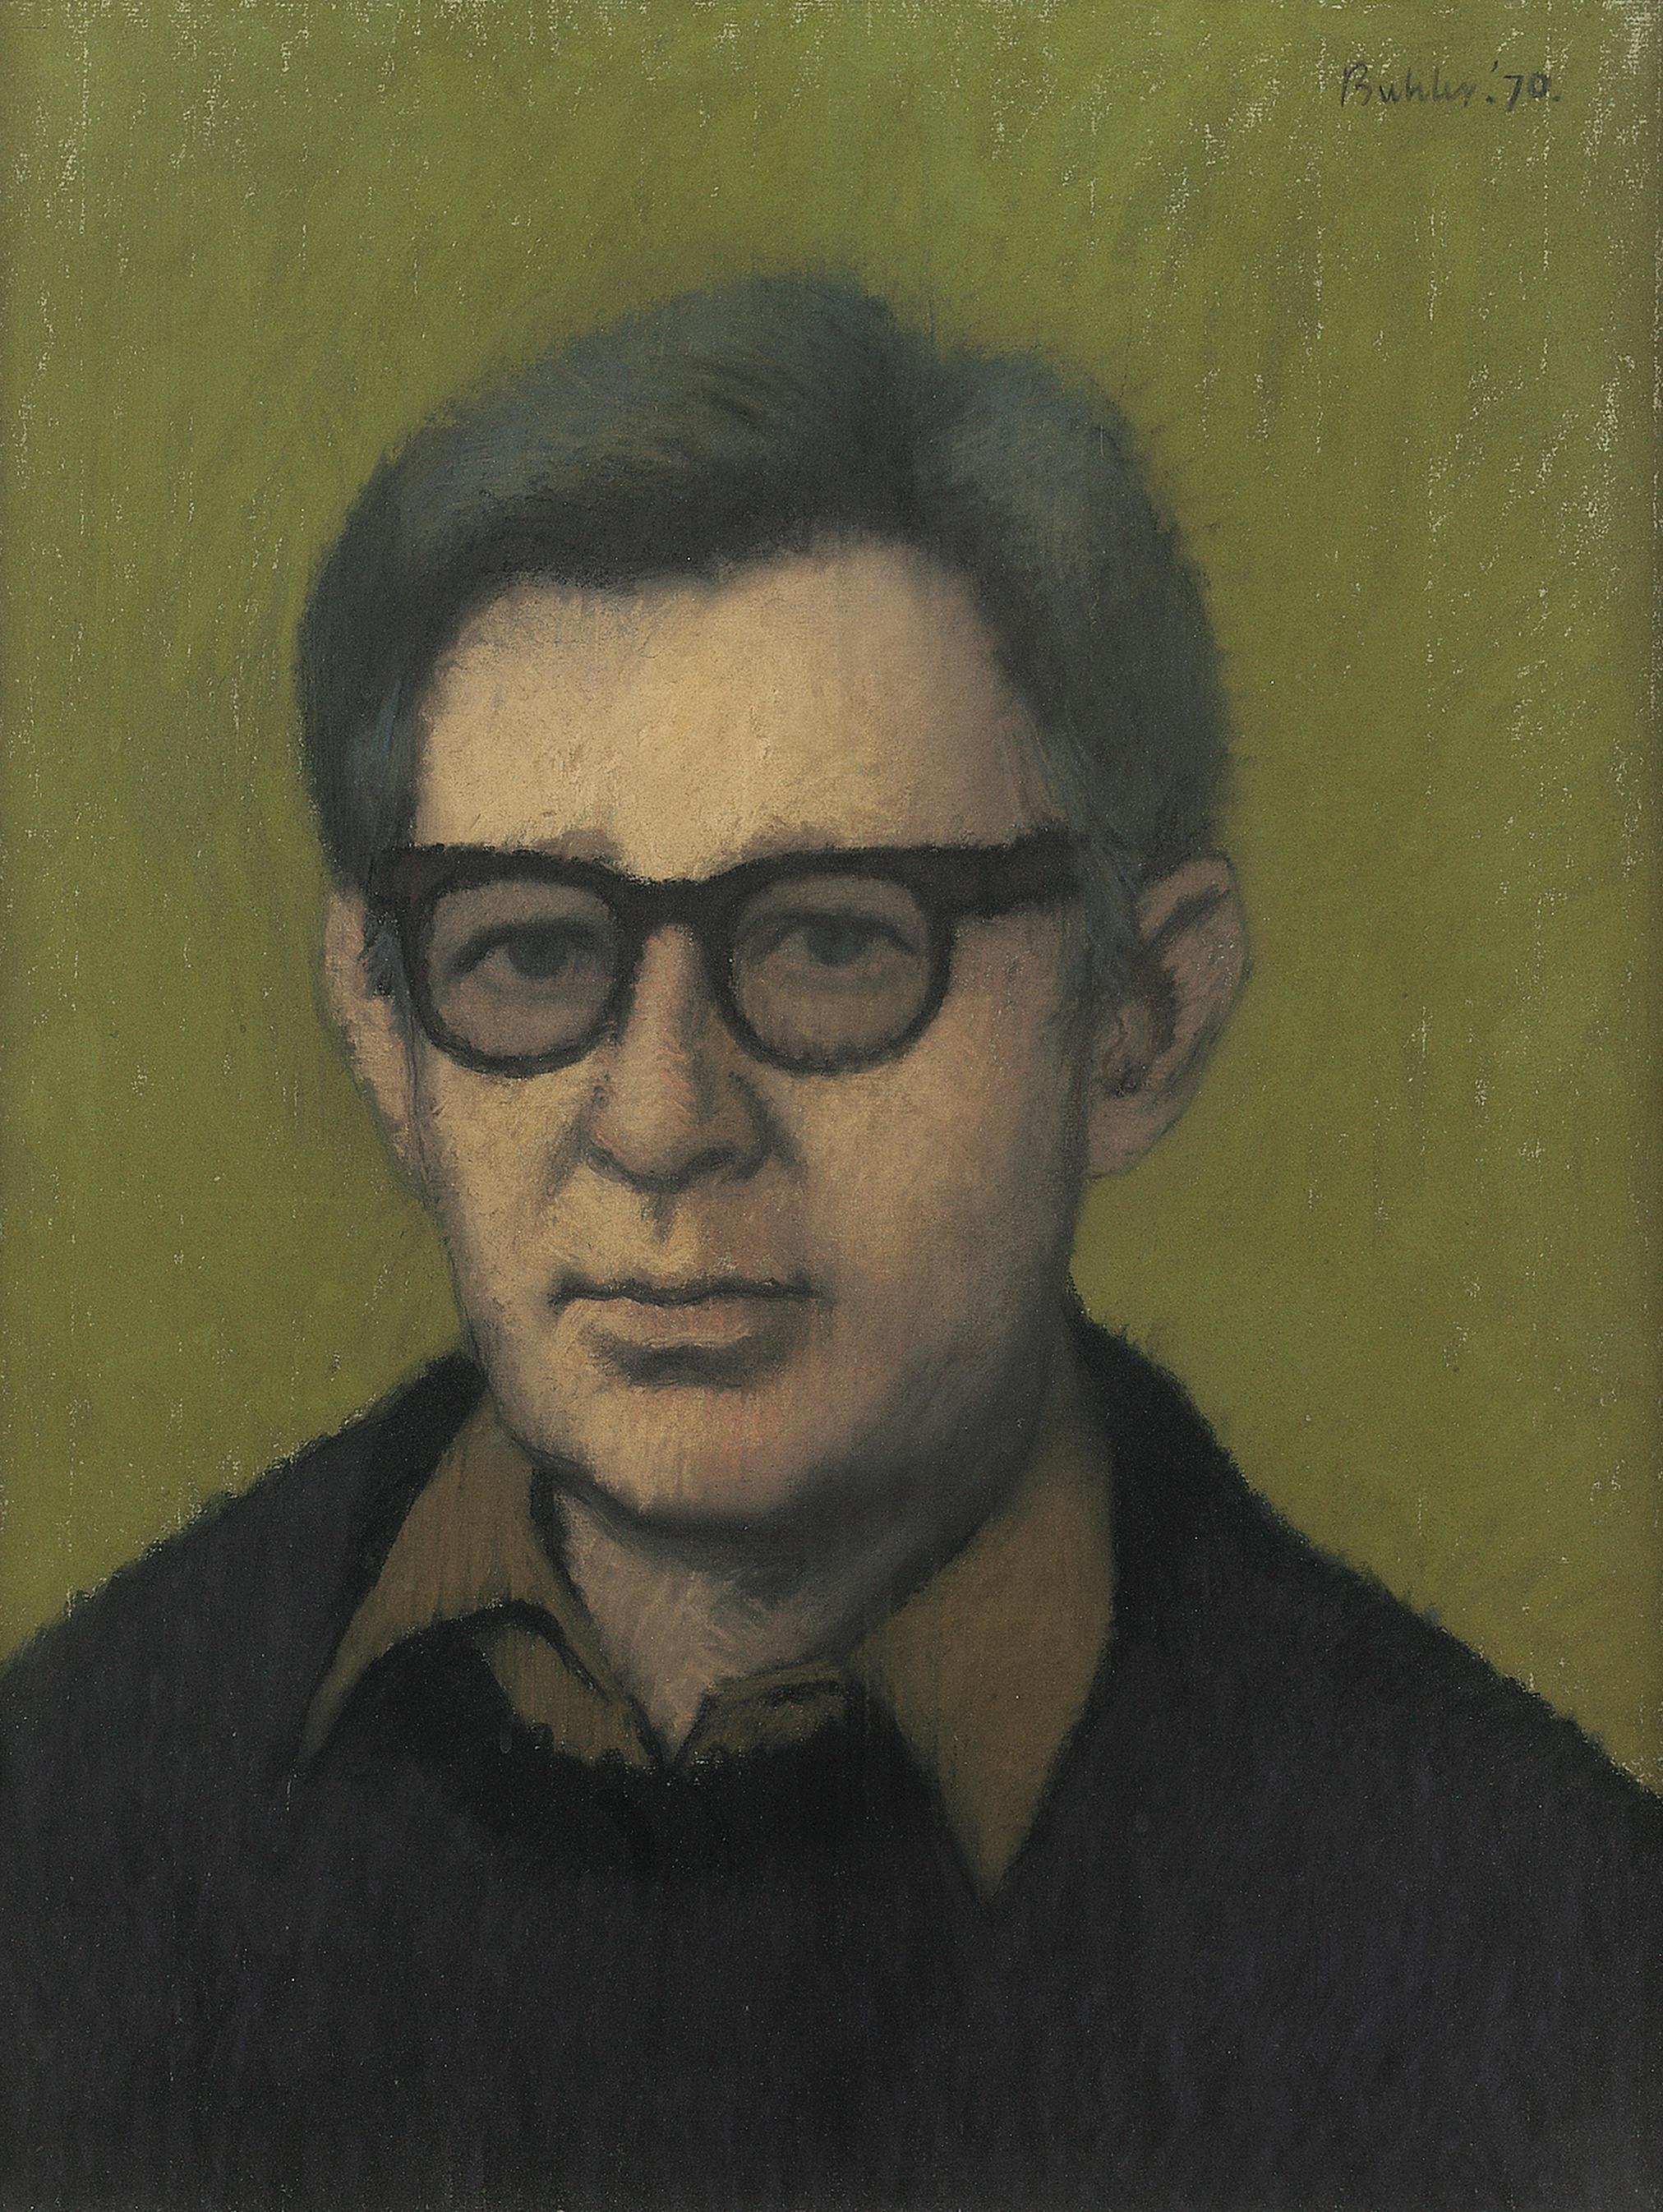 LEE, LAURIE (1914-1997, novelist and poet)